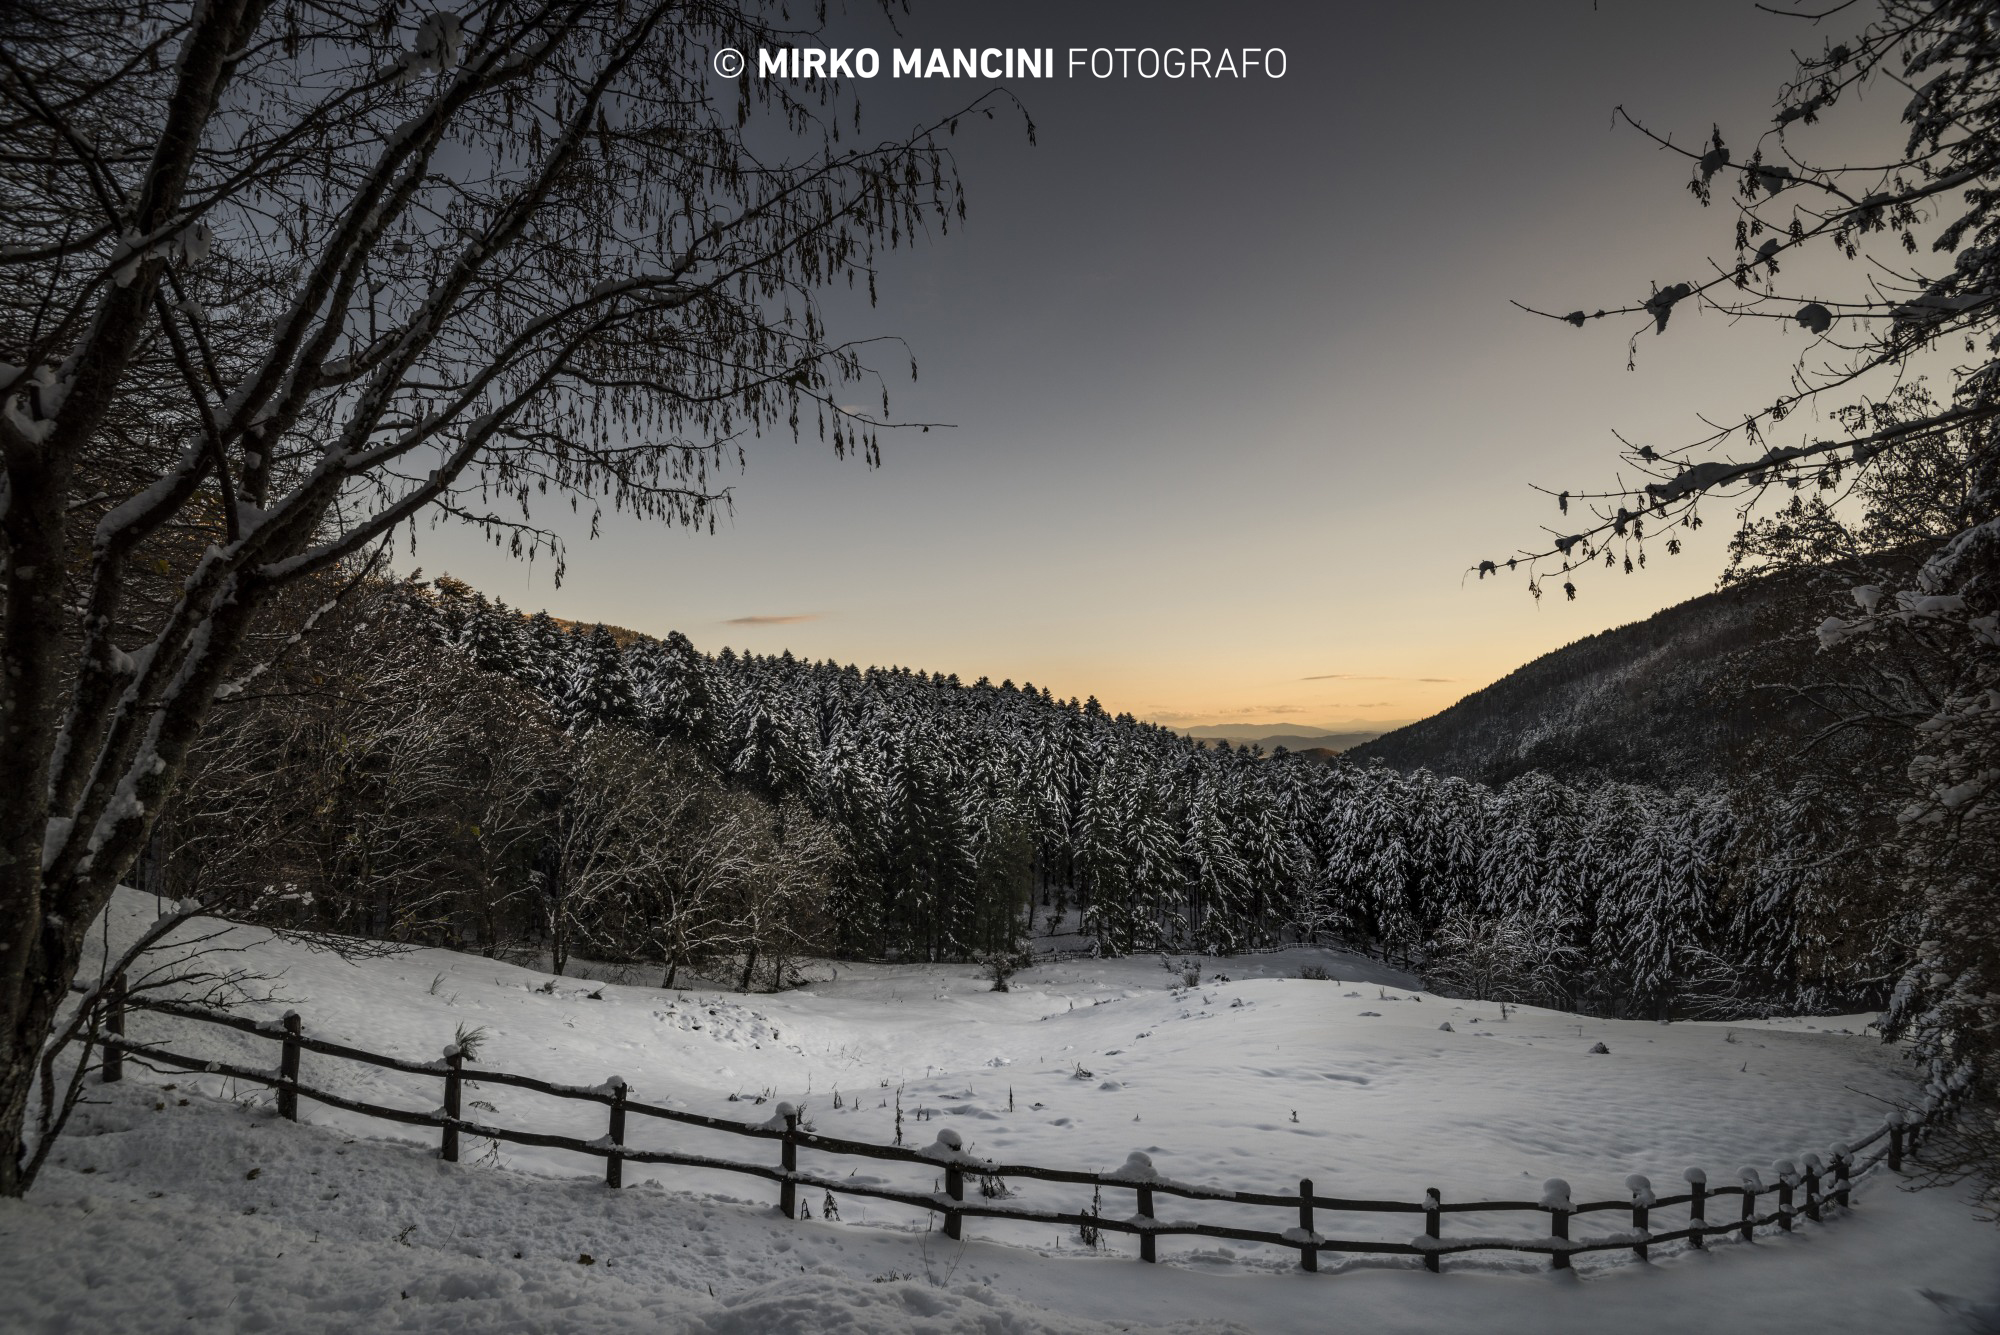 L'inverno a Camaldoli....